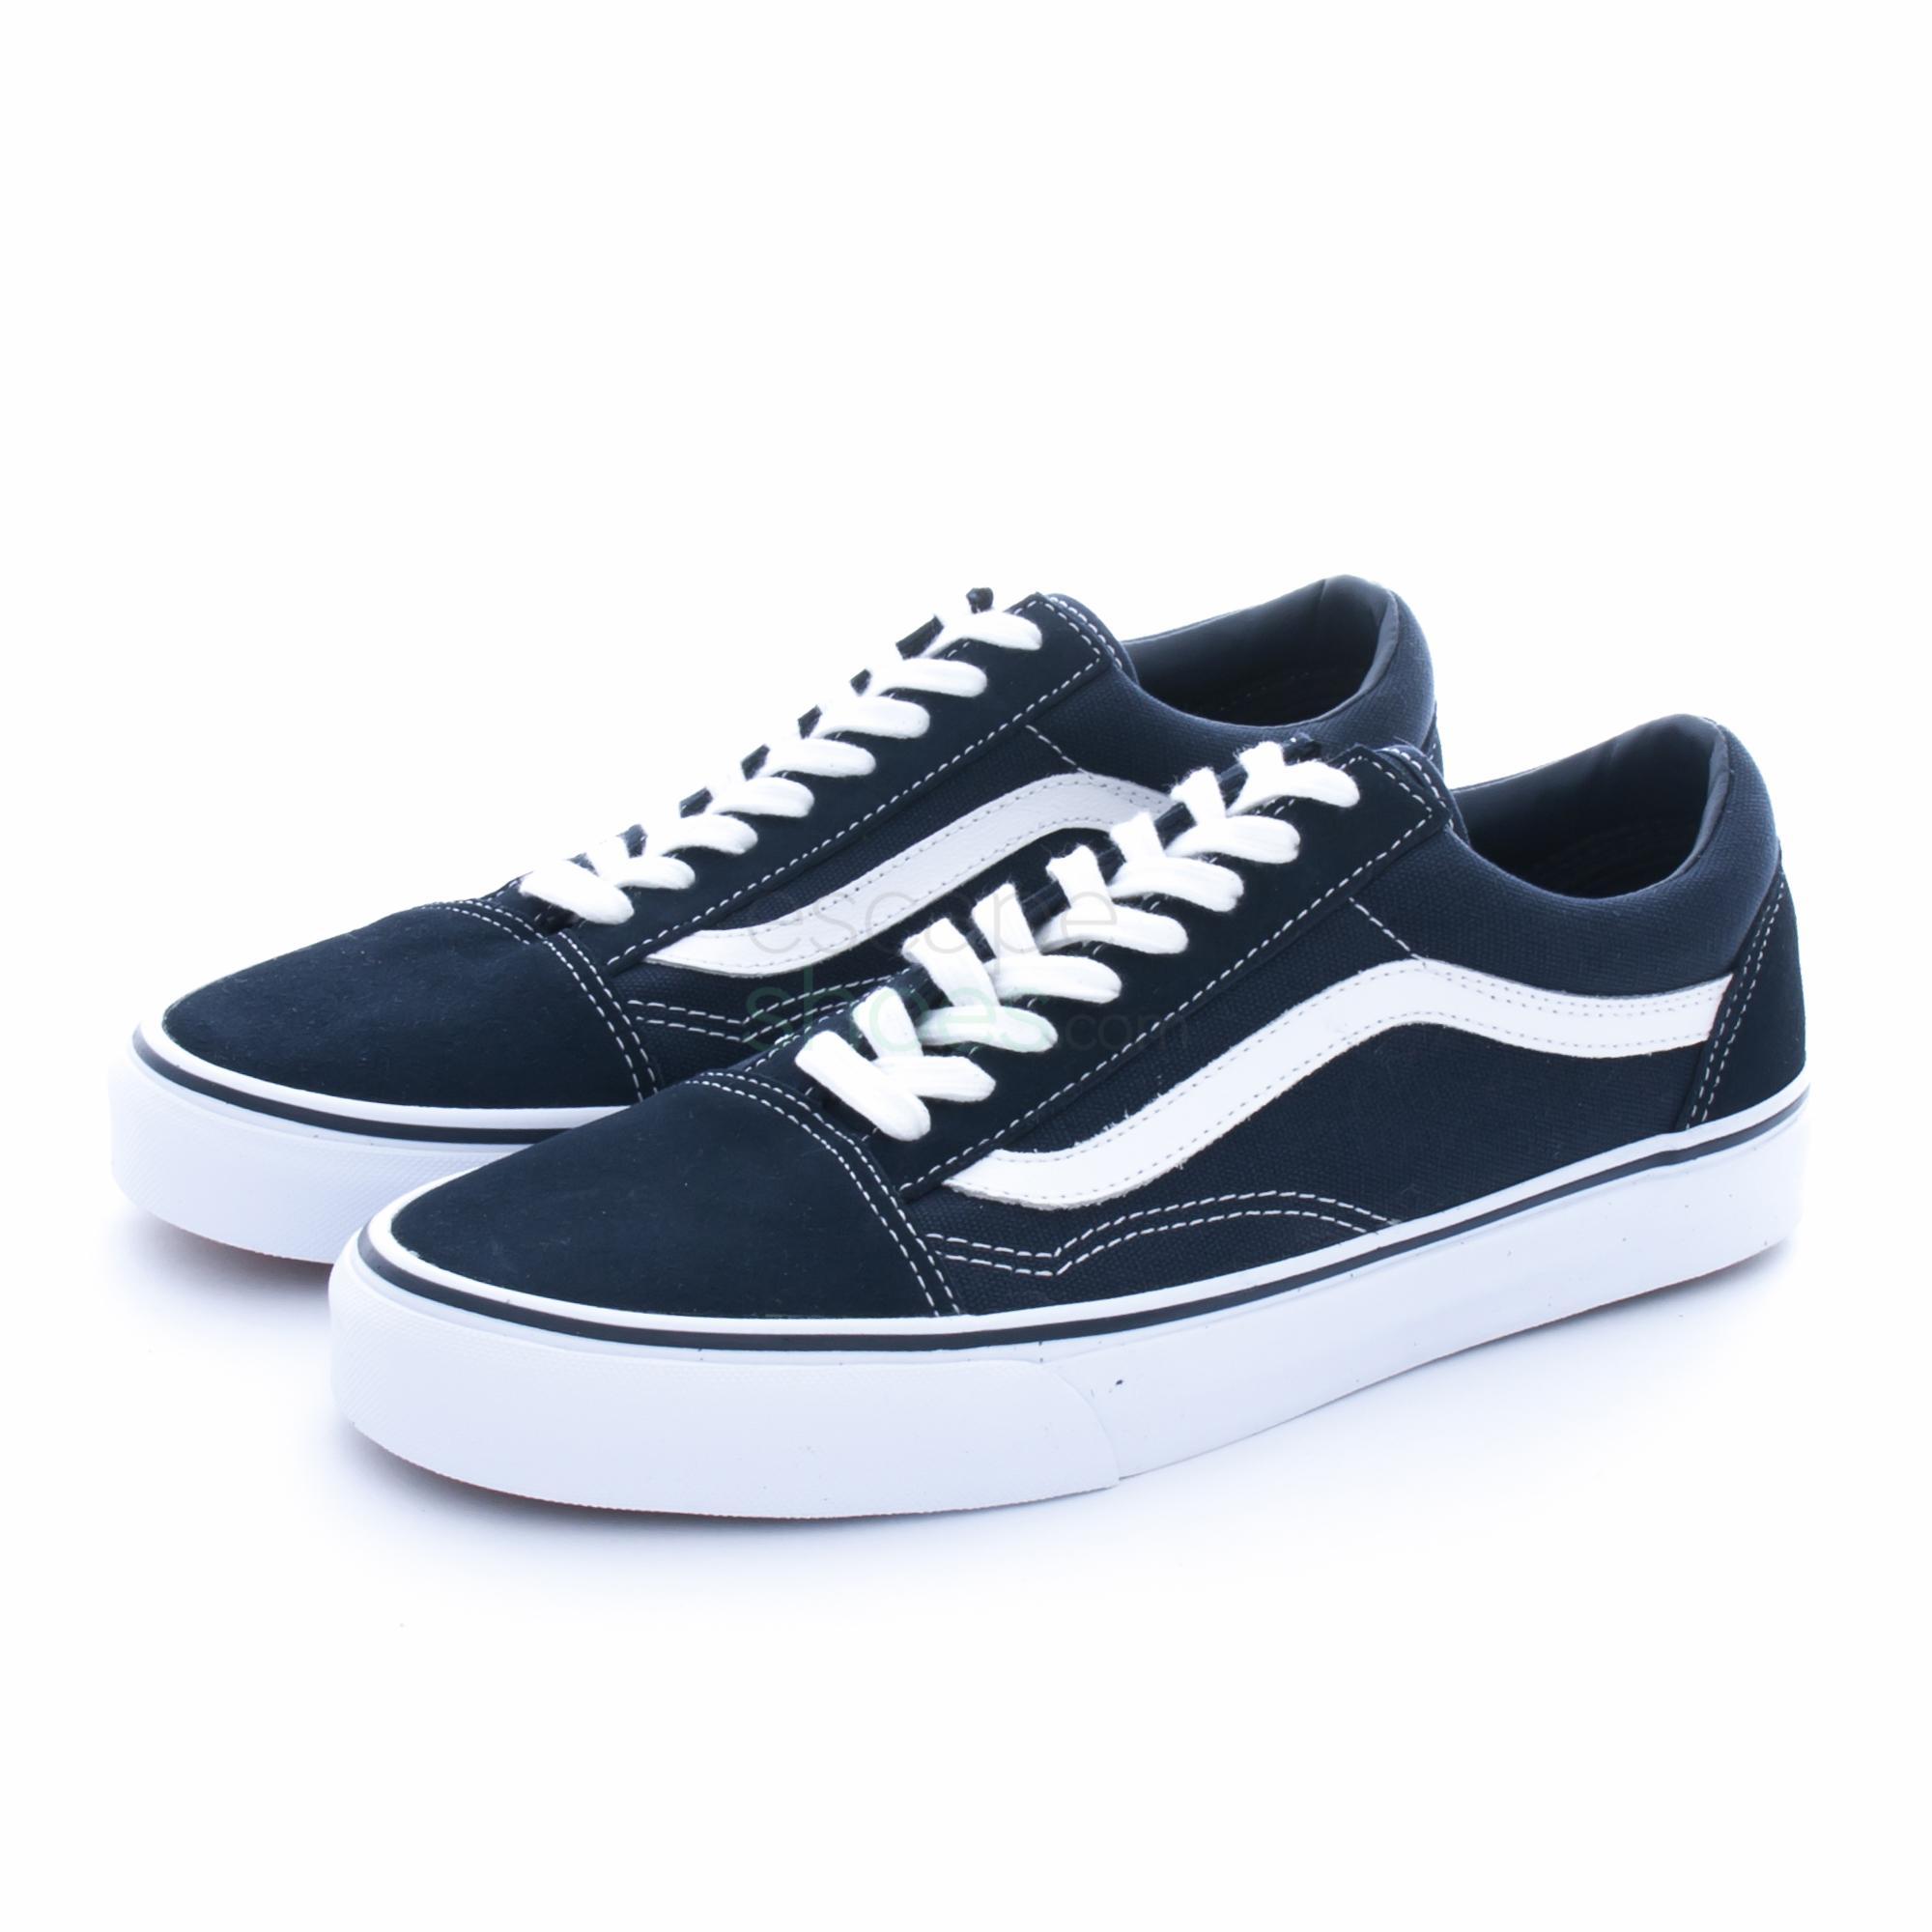 Buy your Sneakers VANS Old Skool Dress Blues True White VZDF4M0 here ... 2ad42241fdef1